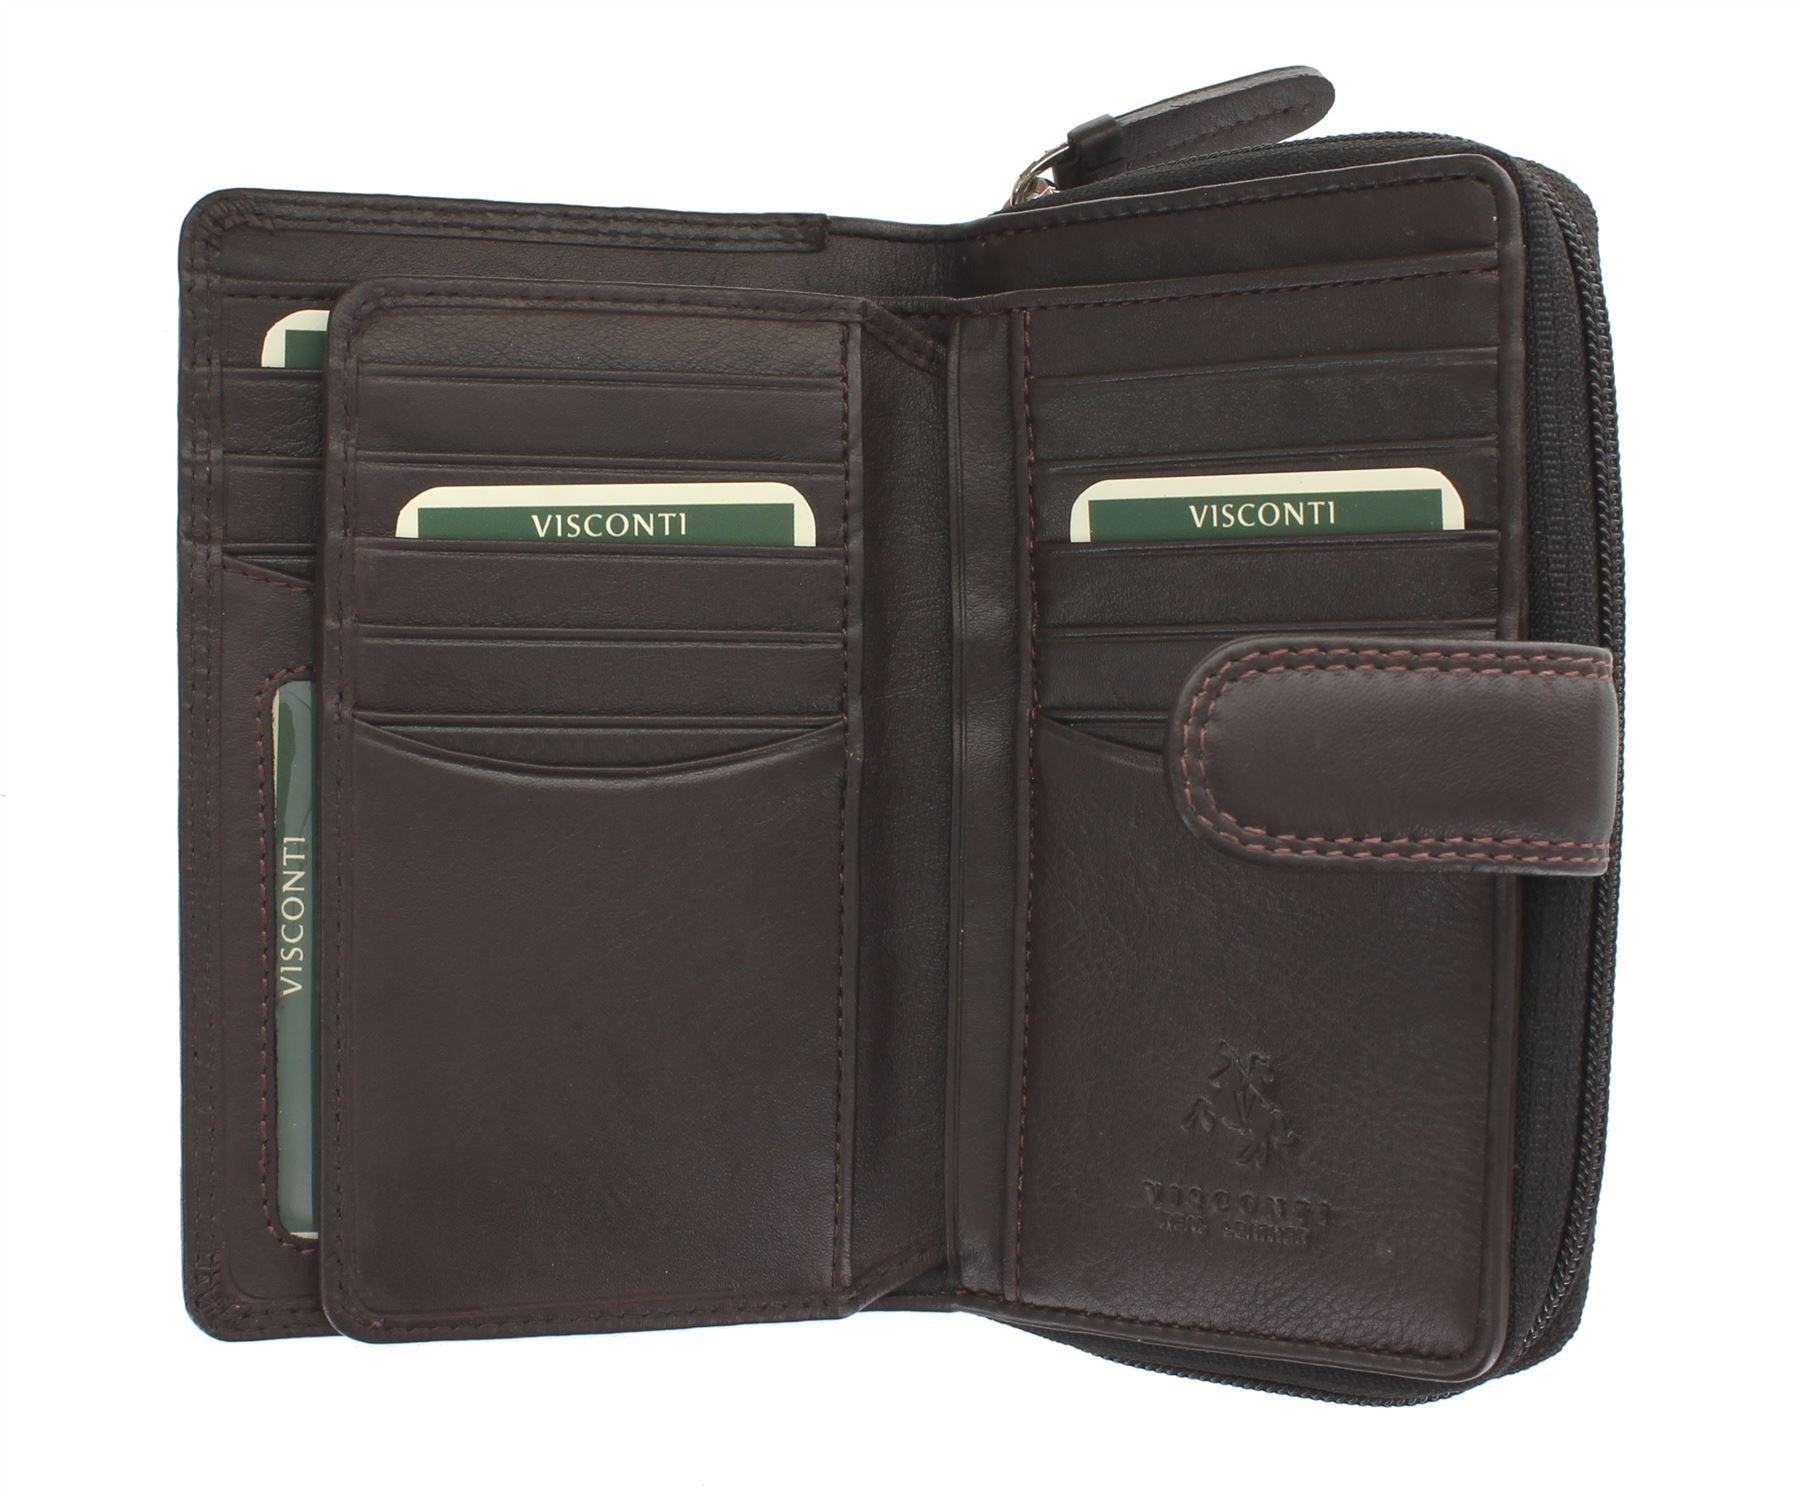 Visconti-Heritage-Collection-MADAME-Leather-Purse-Tab-Closure-RFID-blocking-HT33 miniatura 9